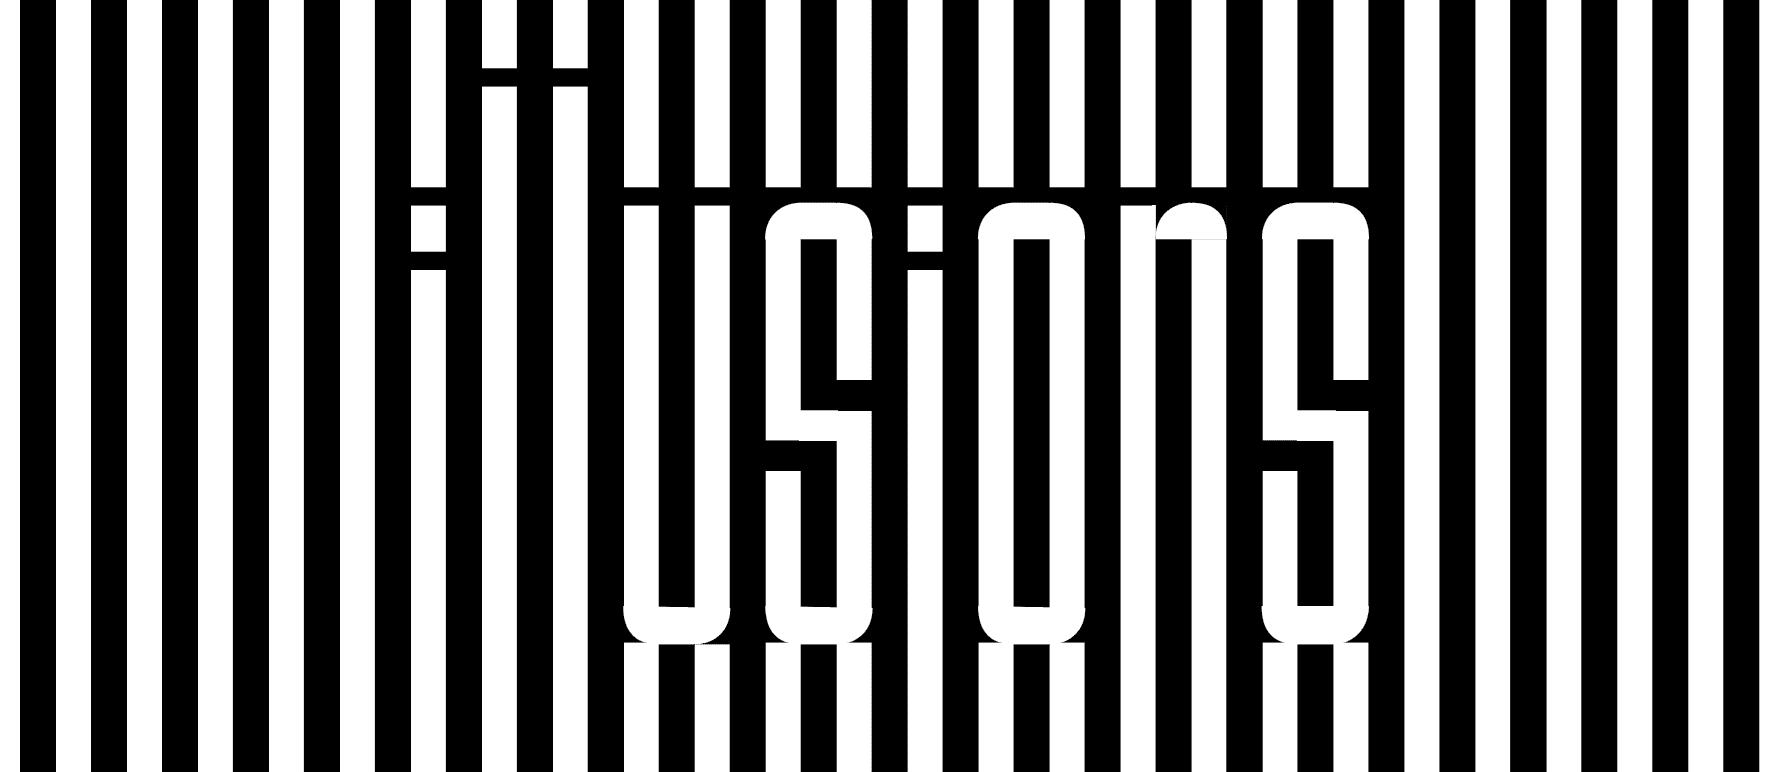 illusion optical illusions word visual paradox oscillating kim scott inspired mishra punya web